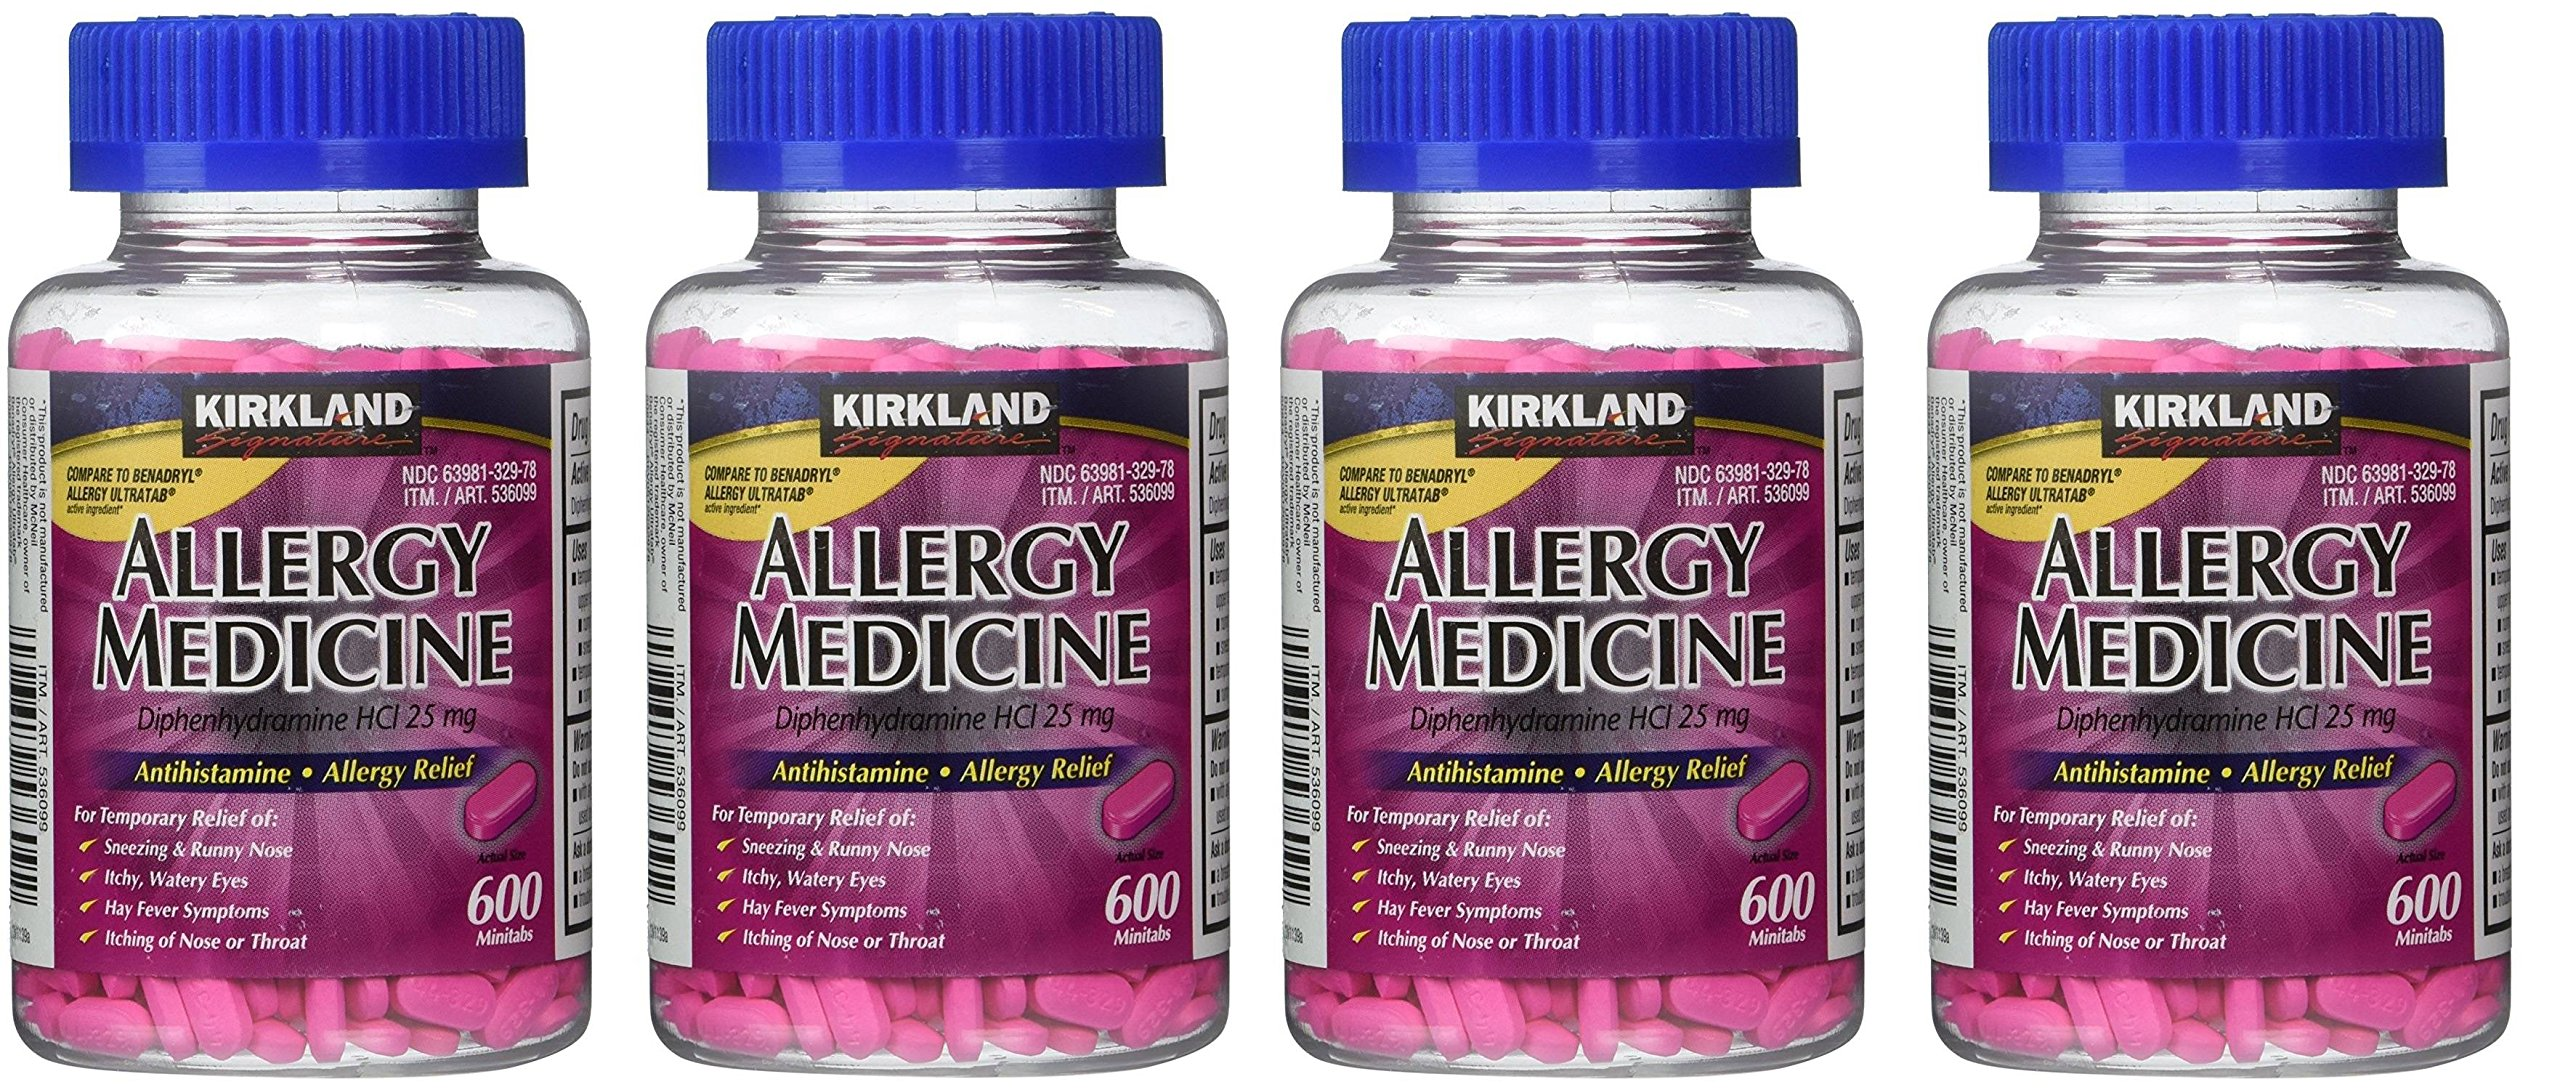 Diphenhydramine HCI 25 Mg - Kirkland Brand - Allergy Medicine and AntihistamineCompare to Active Ingredient of Benadryl Allergy Generic, 600 Count (4 Pack)